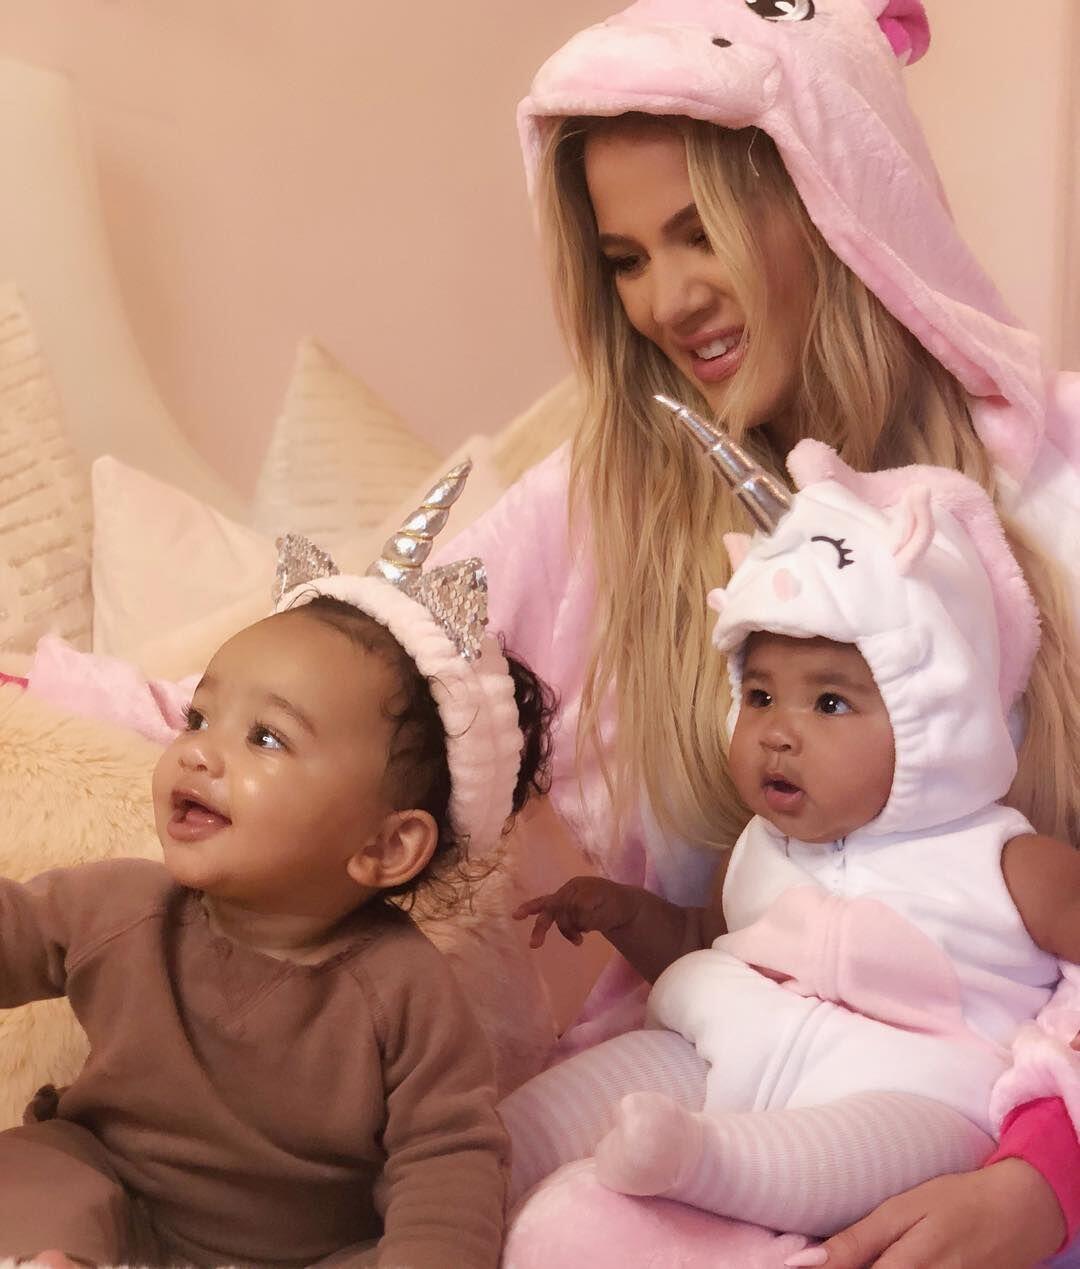 10 Potret Putri Khloe Kardashian Rayakan Halloween Party, Bikin Gemes!